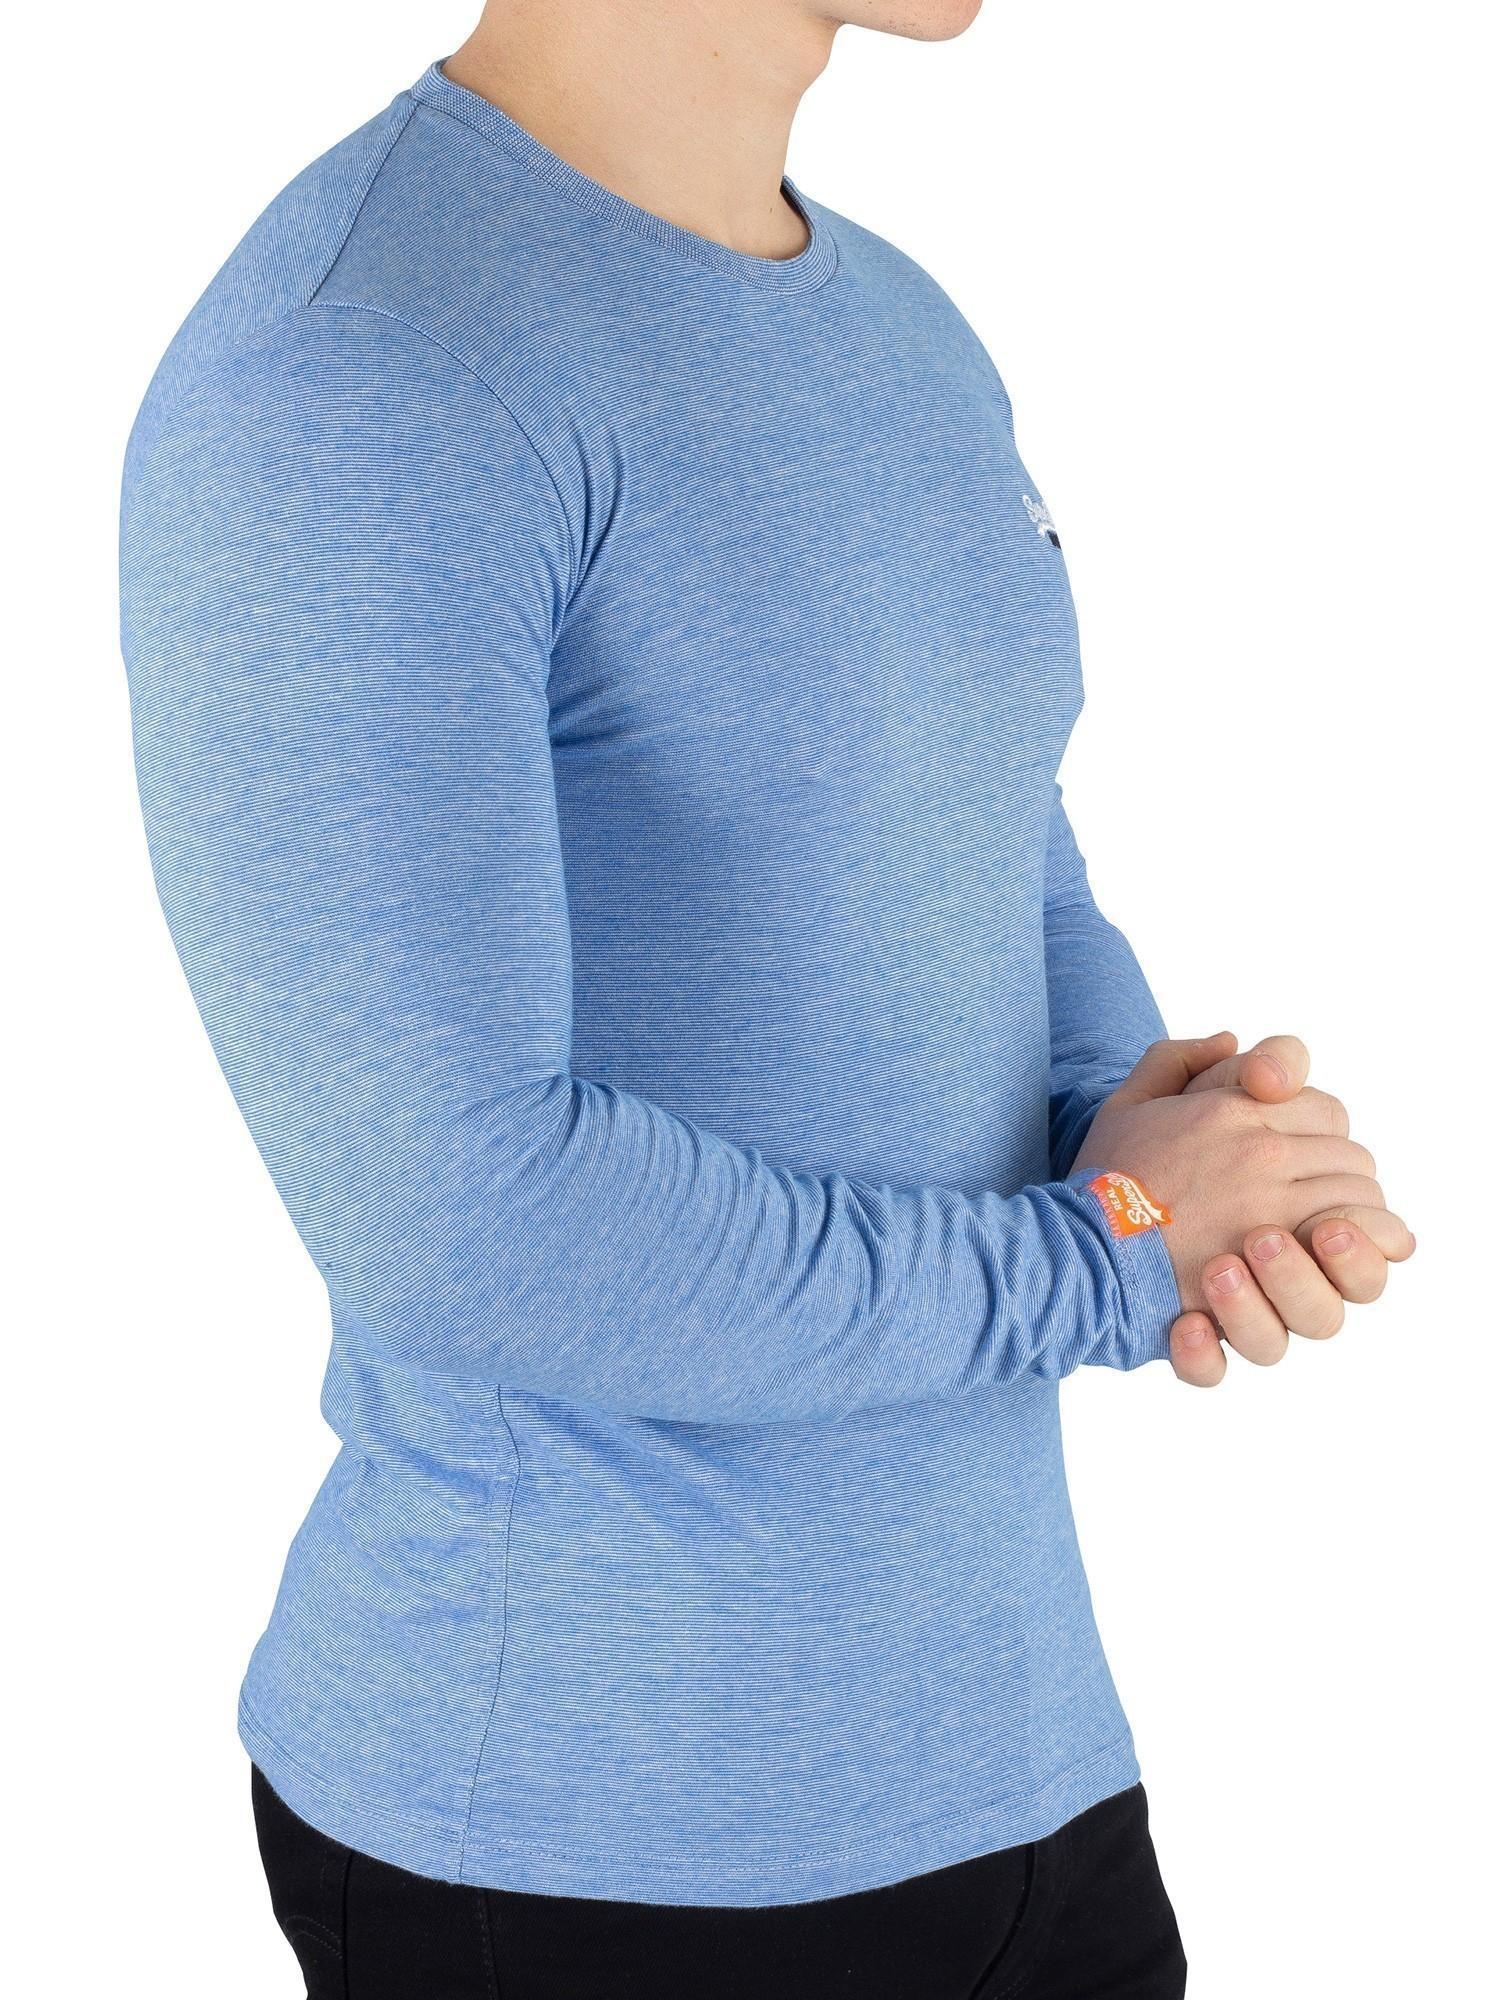 Superdry Mens T Shirt Orange Label Vintage Embroidery Tee Rick Teal Blue